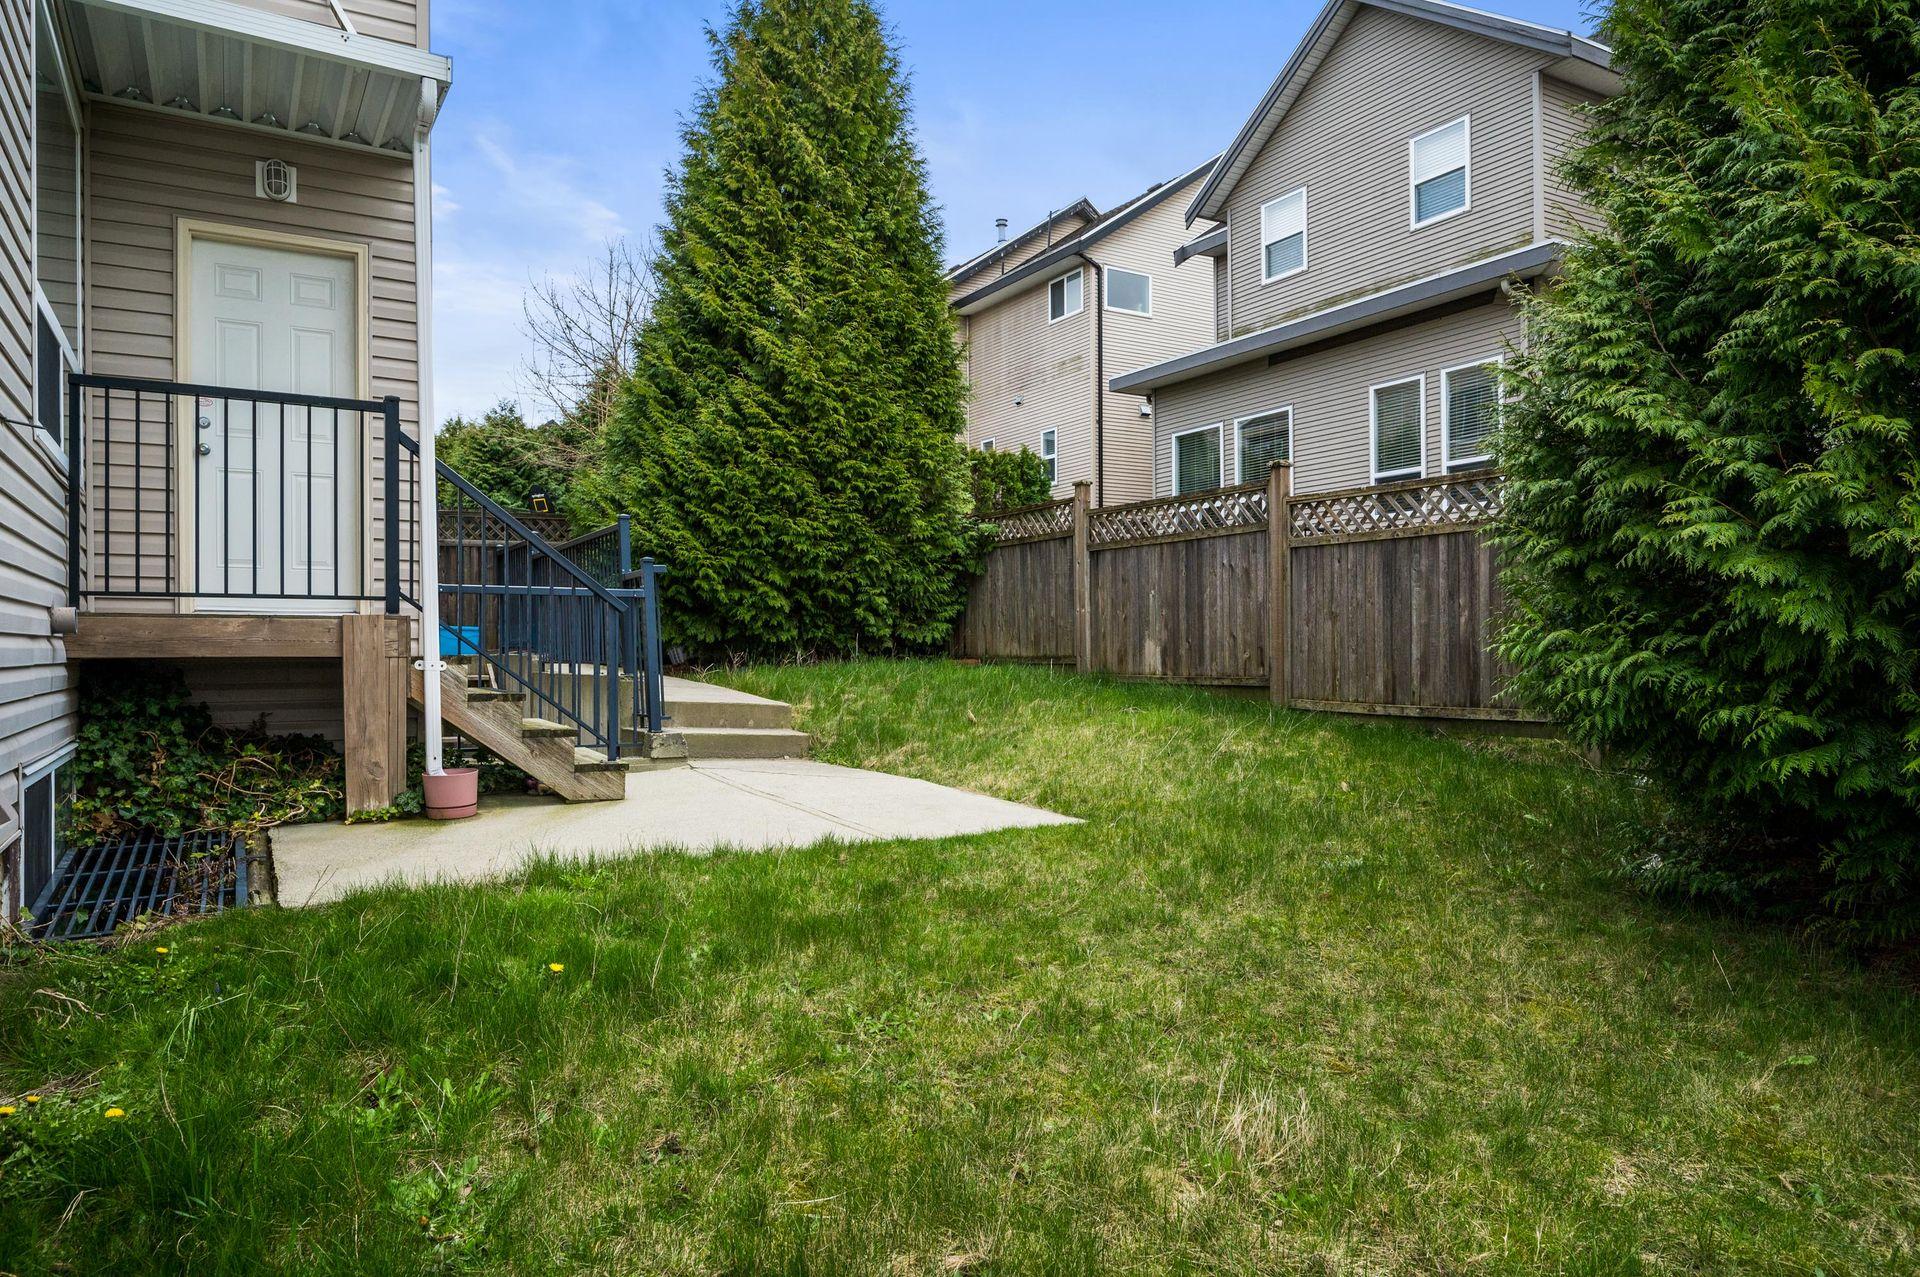 55249_28 at 18350 67 Avenue, Cloverdale BC, Cloverdale